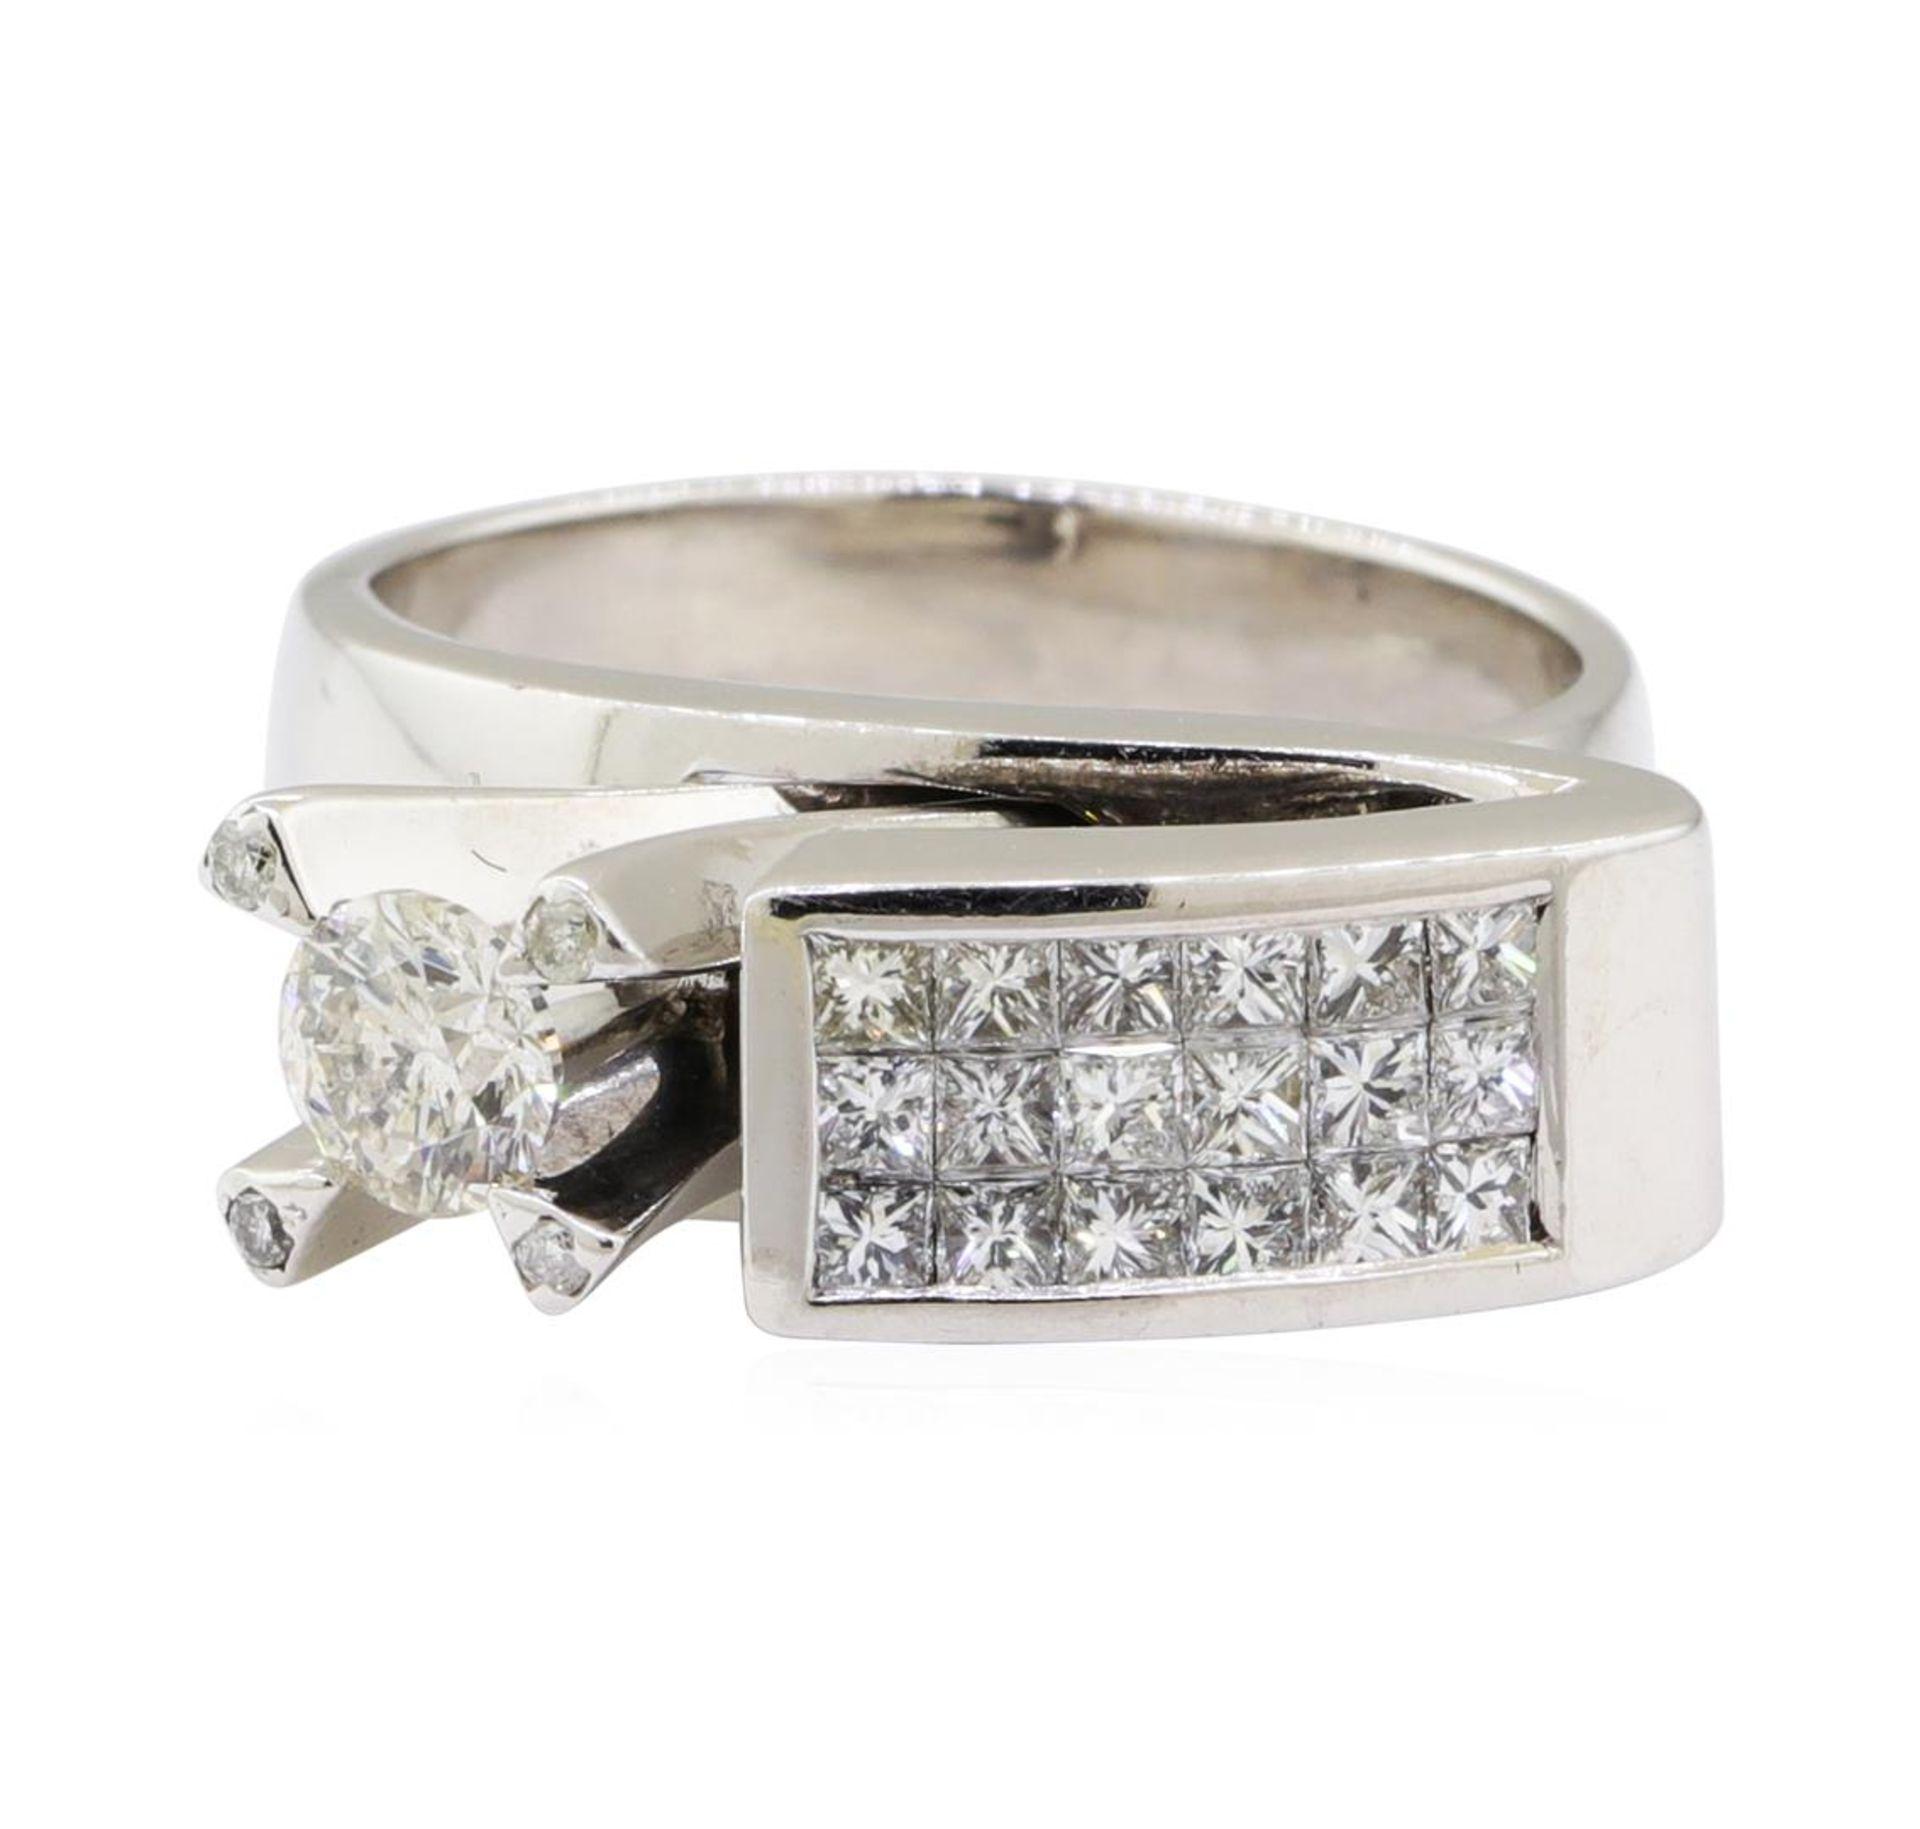 1.29 ctw Diamond Ring - 14KT White Gold - Image 2 of 5